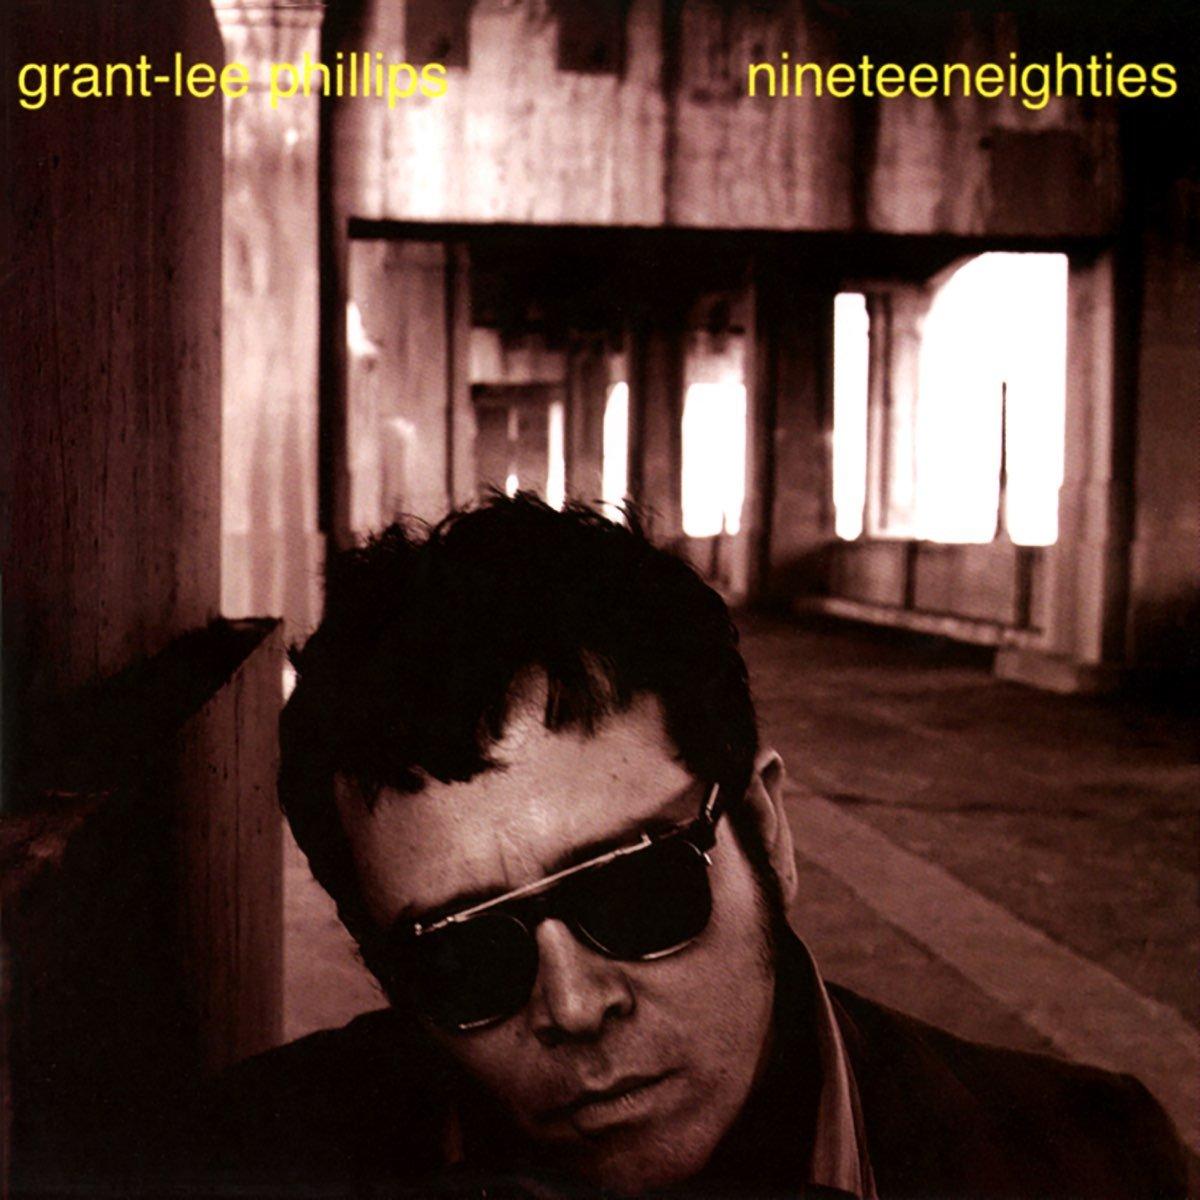 Grant-Lee Phillips, Nineteeneighties